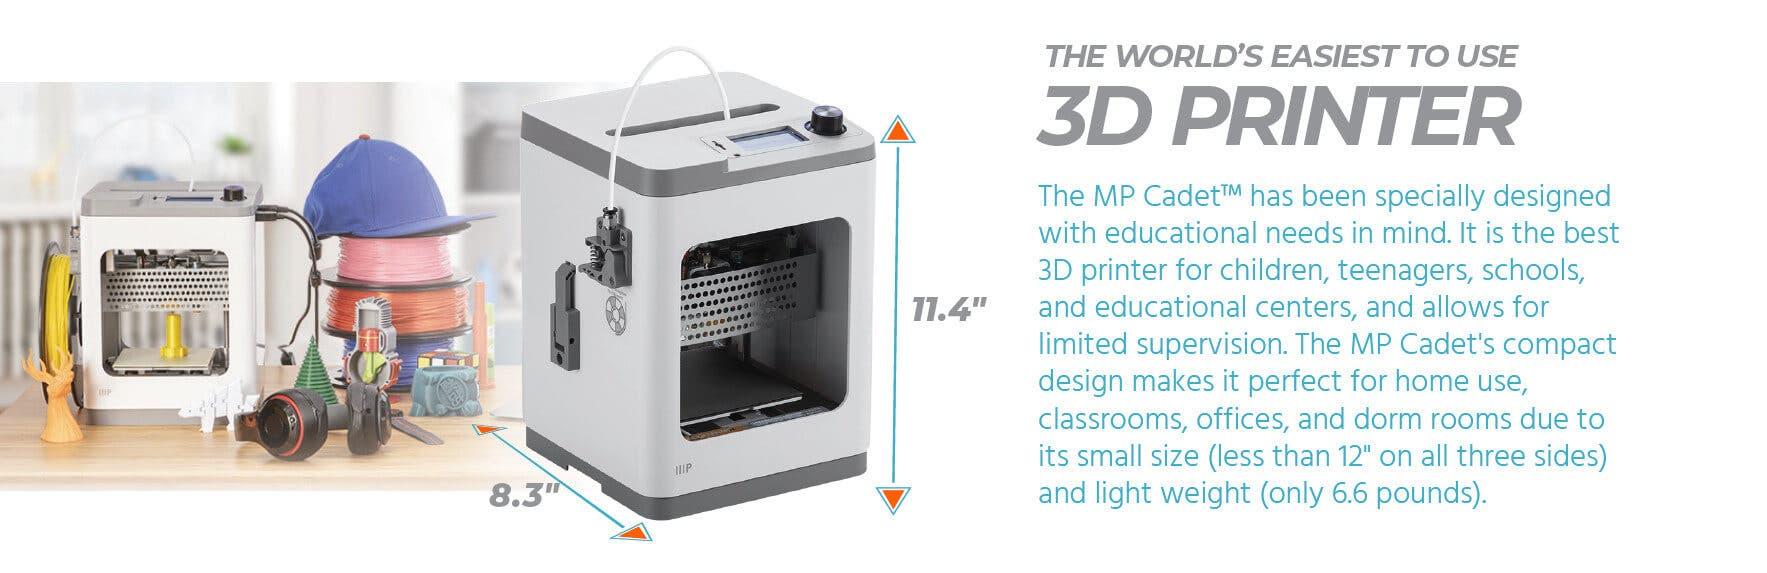 Imprimante Cadet 3D